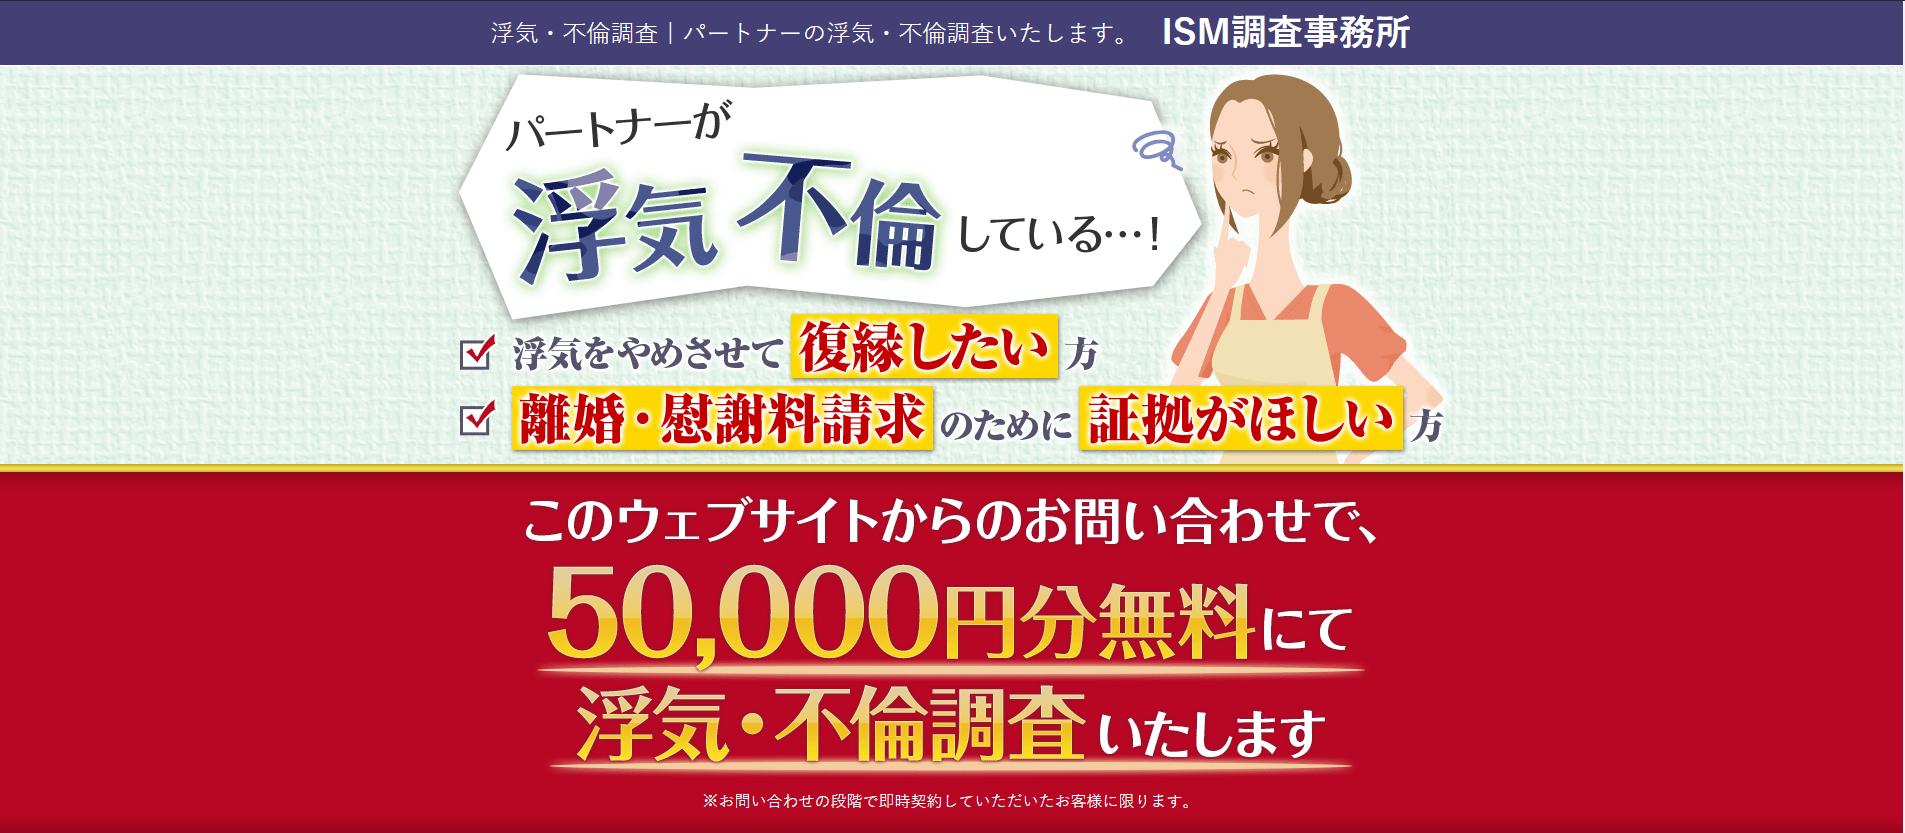 ism調査事務所 2018 公式ホームページ